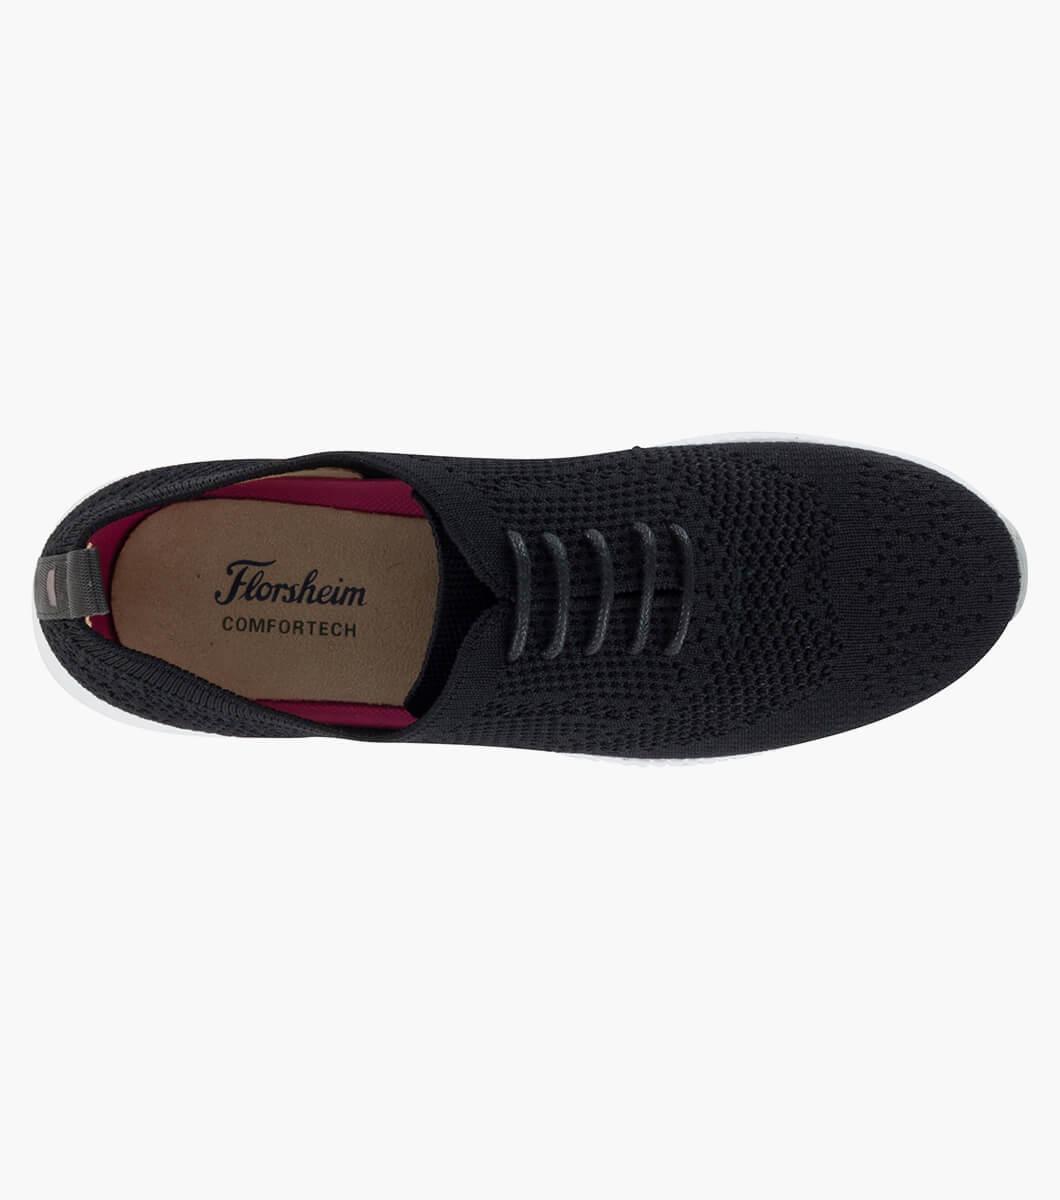 thumbnail 18 - Brand New Women's Florsheim Nina Sneakers